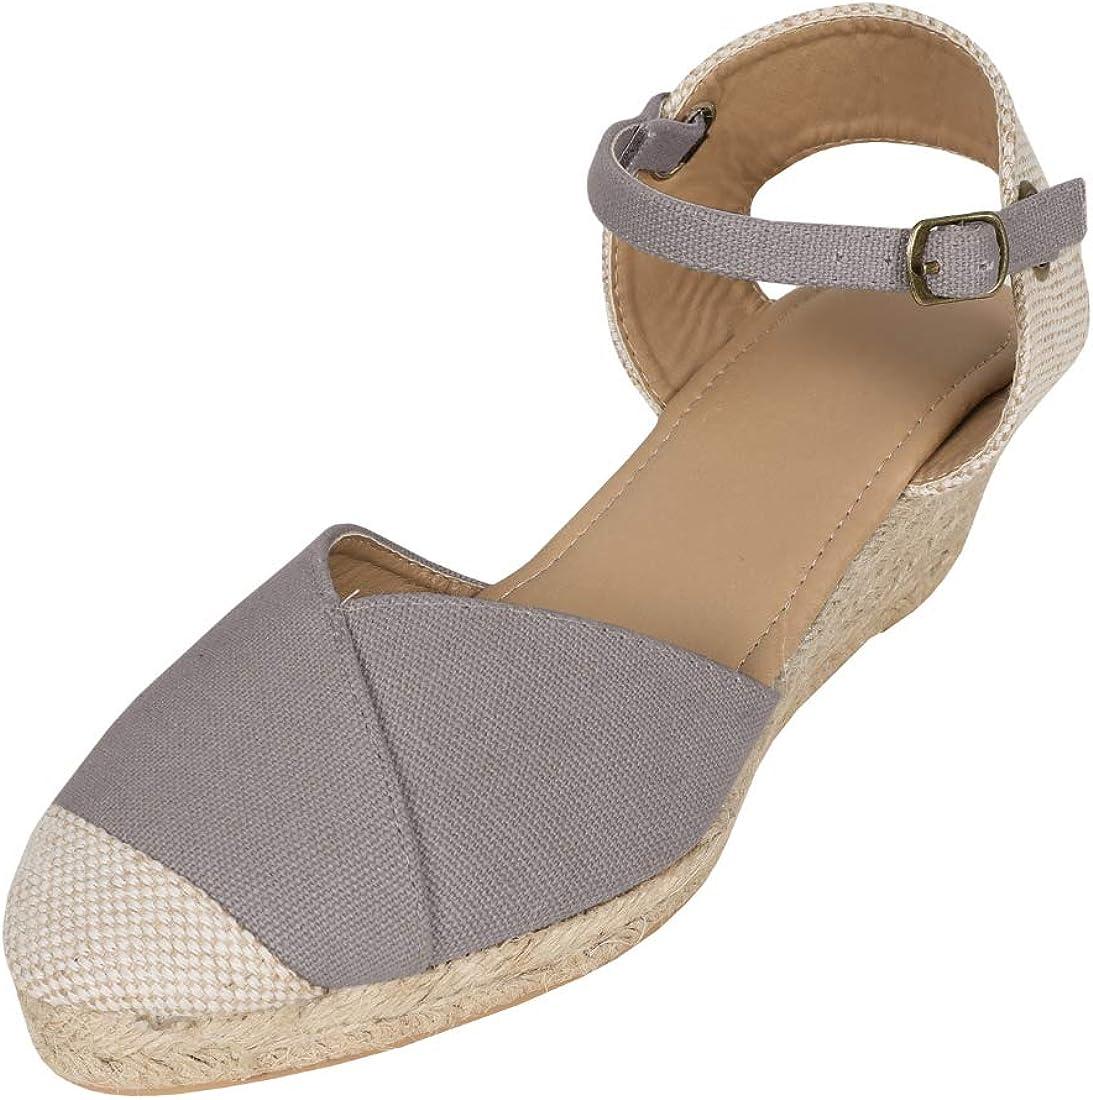 Womens Wedge Platform Espadrille Sandals Closed Toe Cap Ankle Strap Mid Heel Slingback Summer Shoes